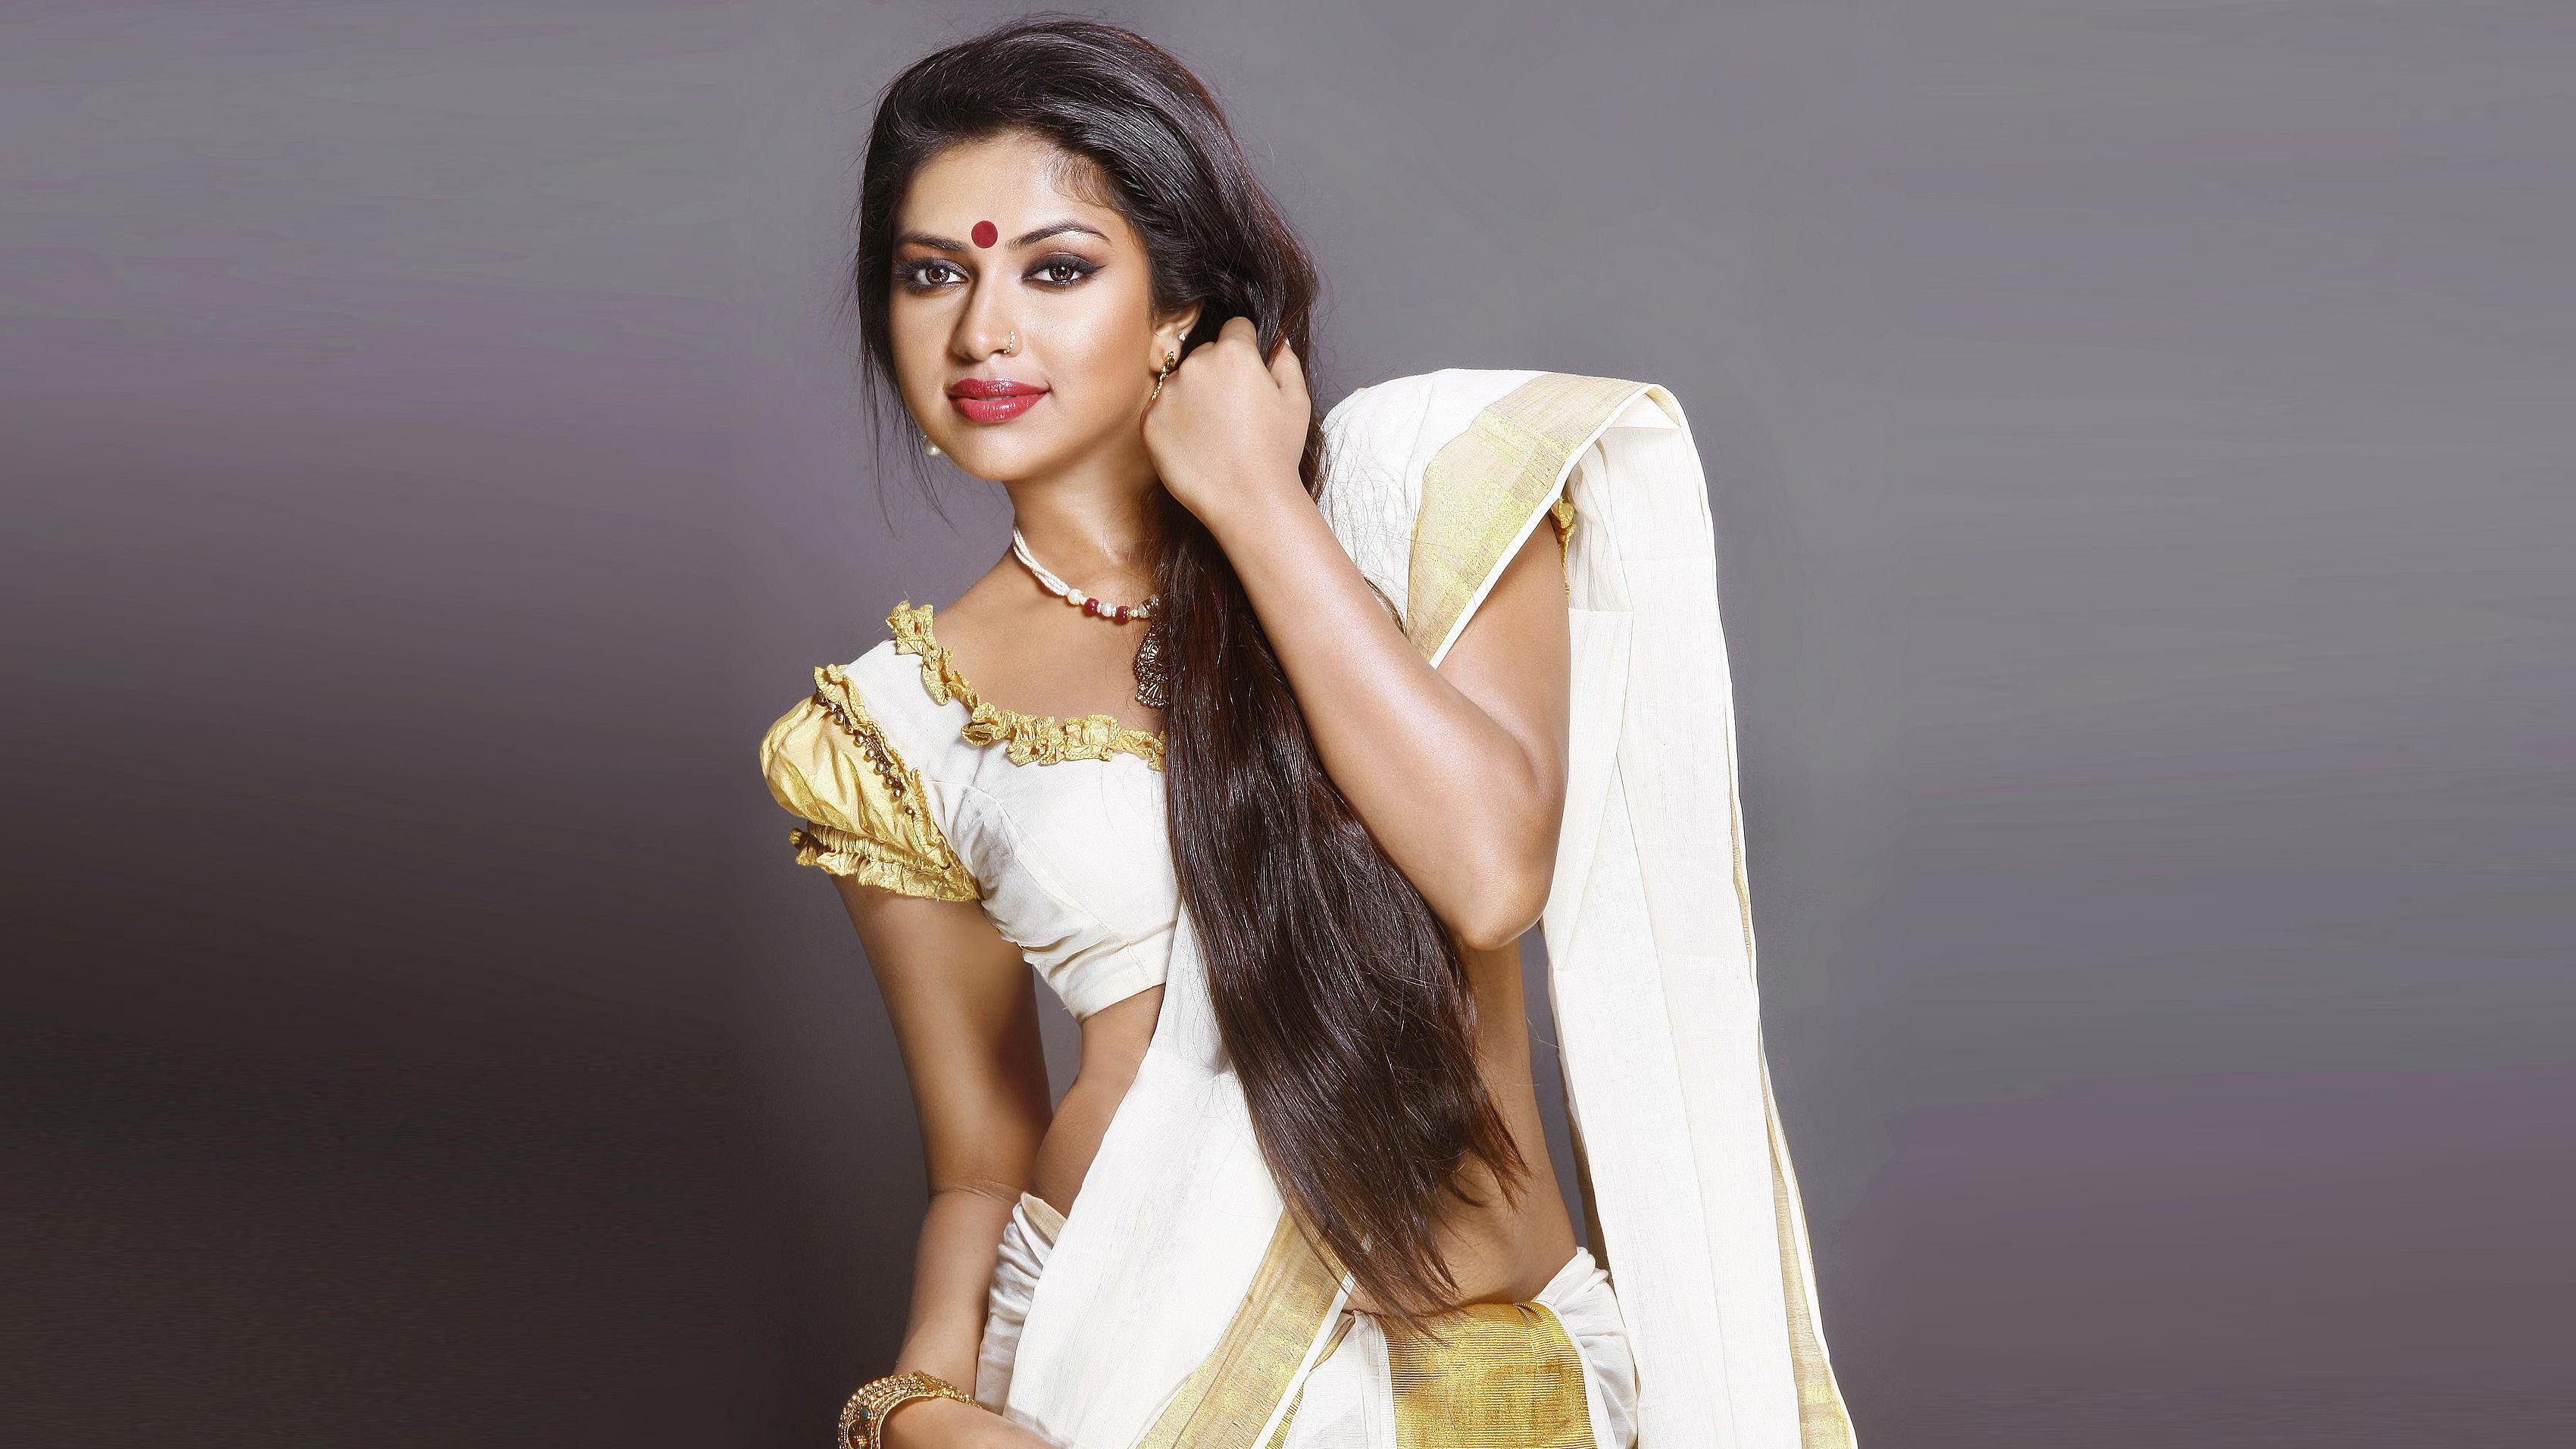 Amala Paul Sex Movie south heroine hd wallpaper download - amala paul in saree